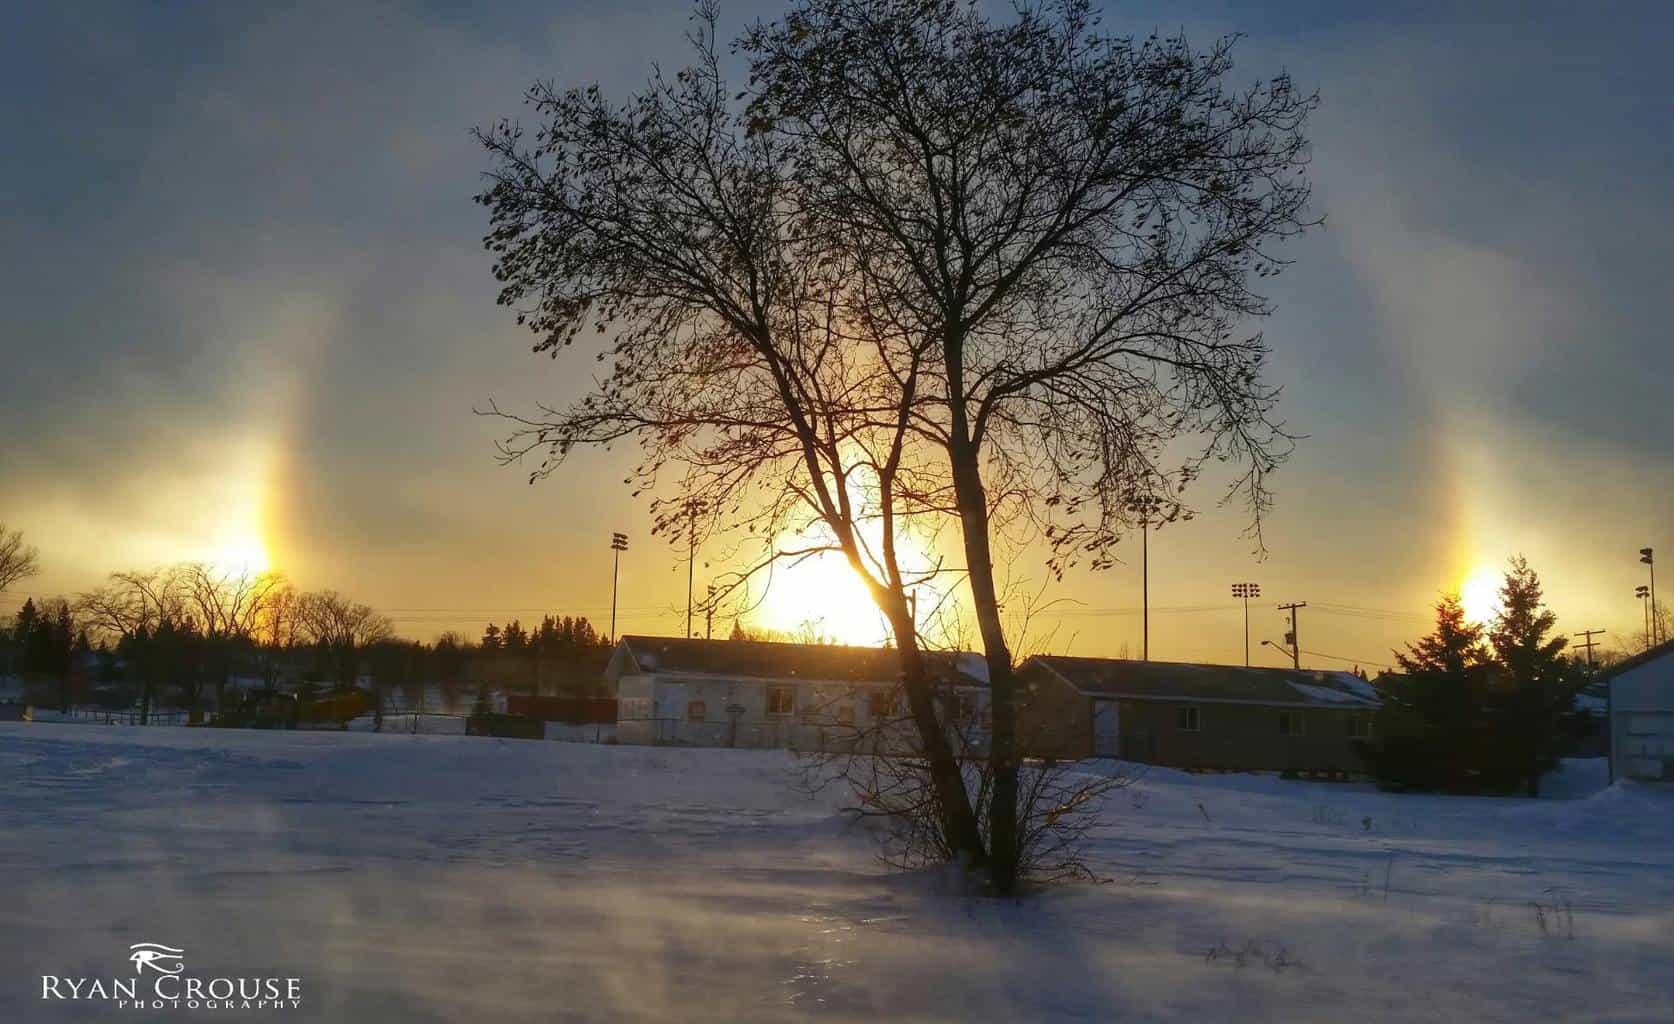 Crazy Sundog over Yorkton Sk. Canada on Jan 8, 2015